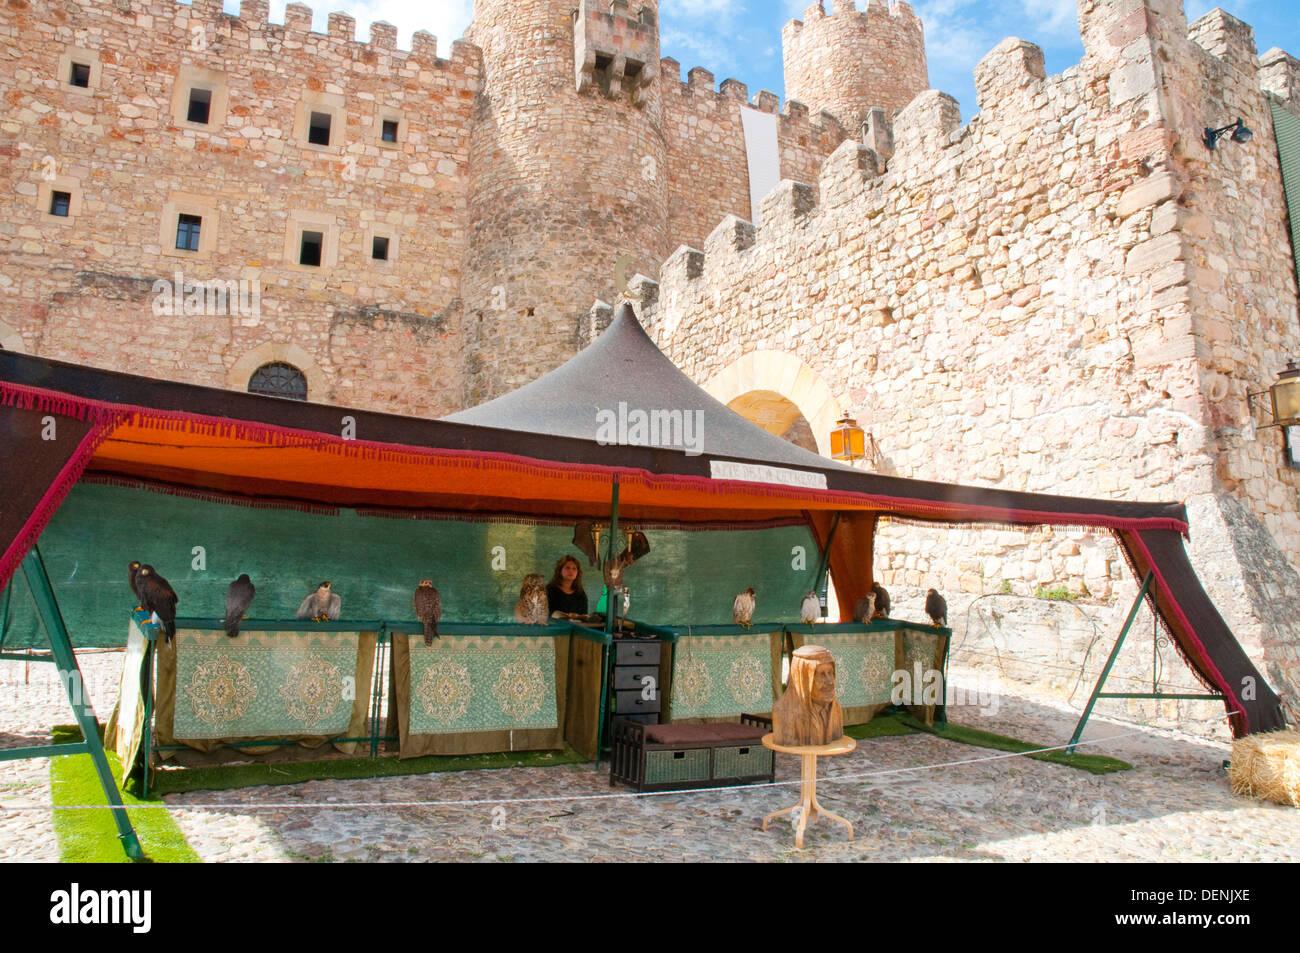 Falconry stall nearby the castle. Medieval Days, Sigüenza, Guadalajara province, Castilla La Mancha, Spain. - Stock Image